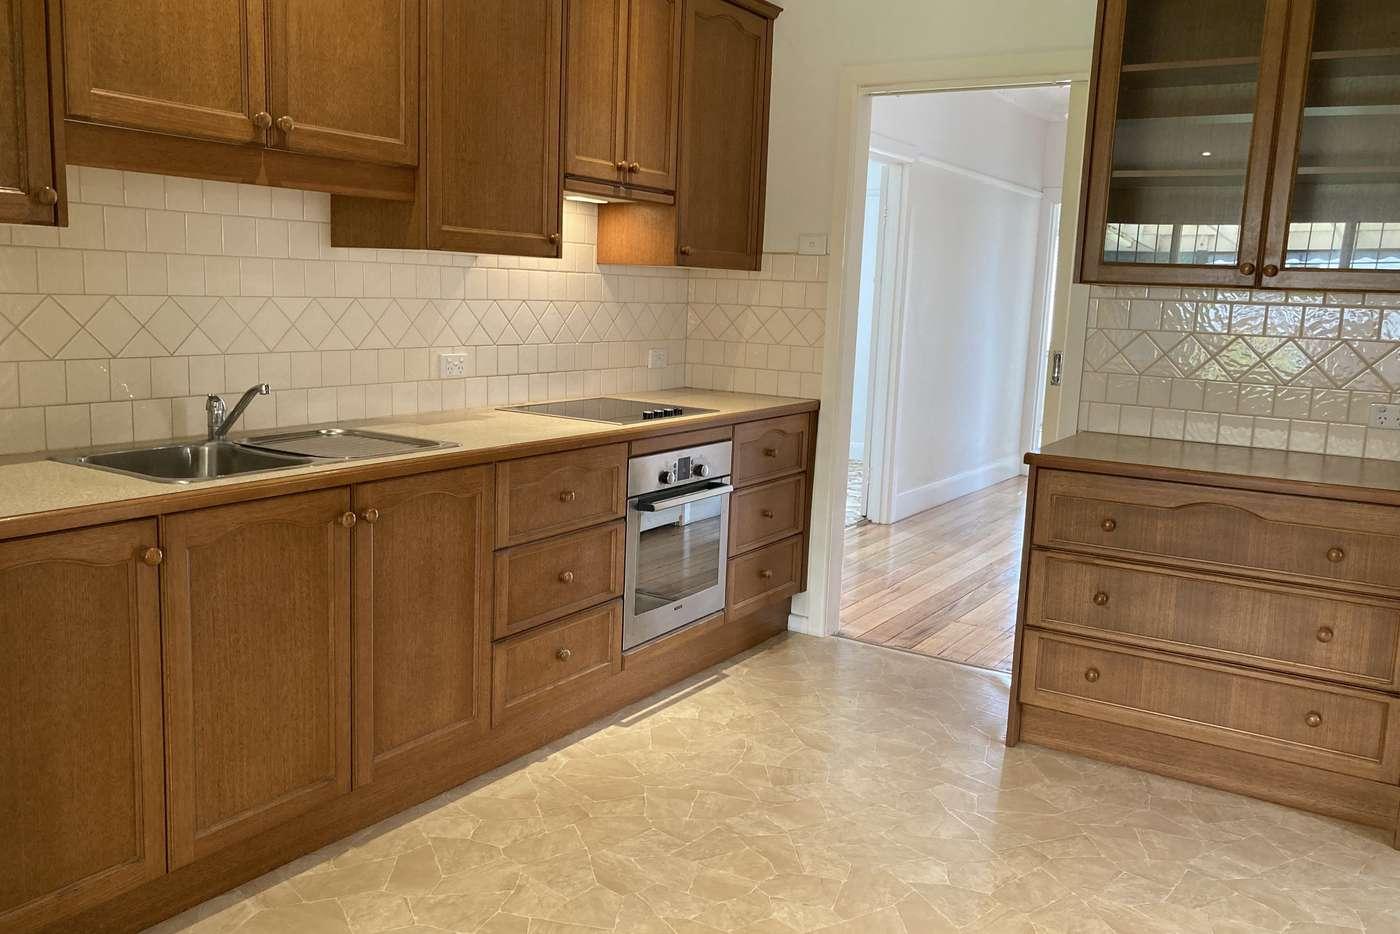 Sixth view of Homely house listing, 324 Gordon Street, Maribyrnong VIC 3032